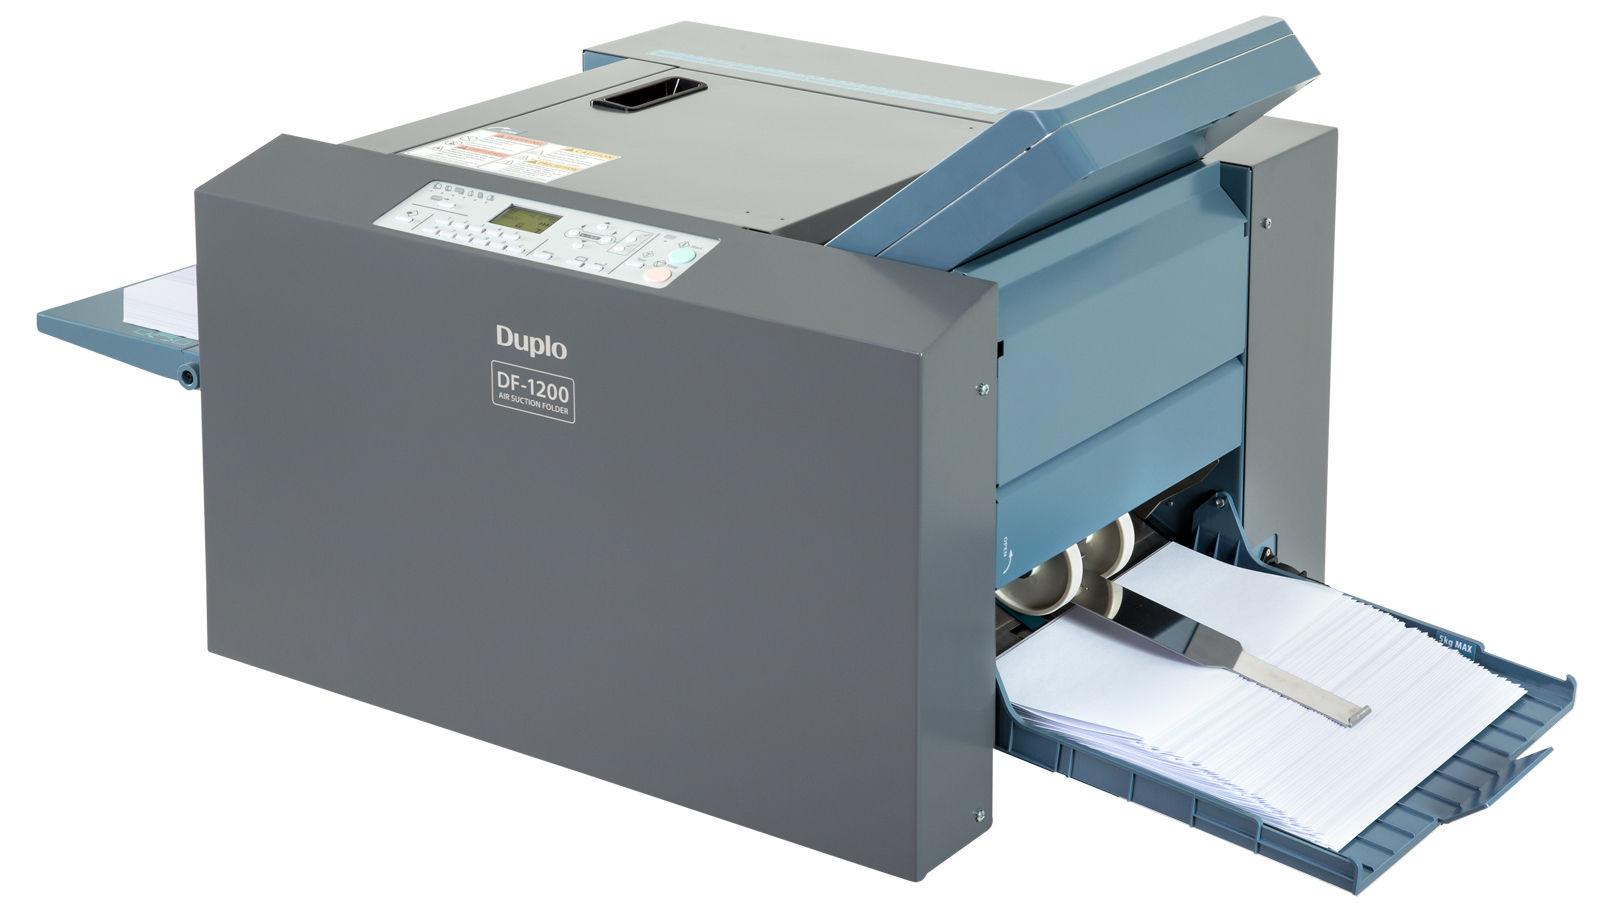 DF-1200